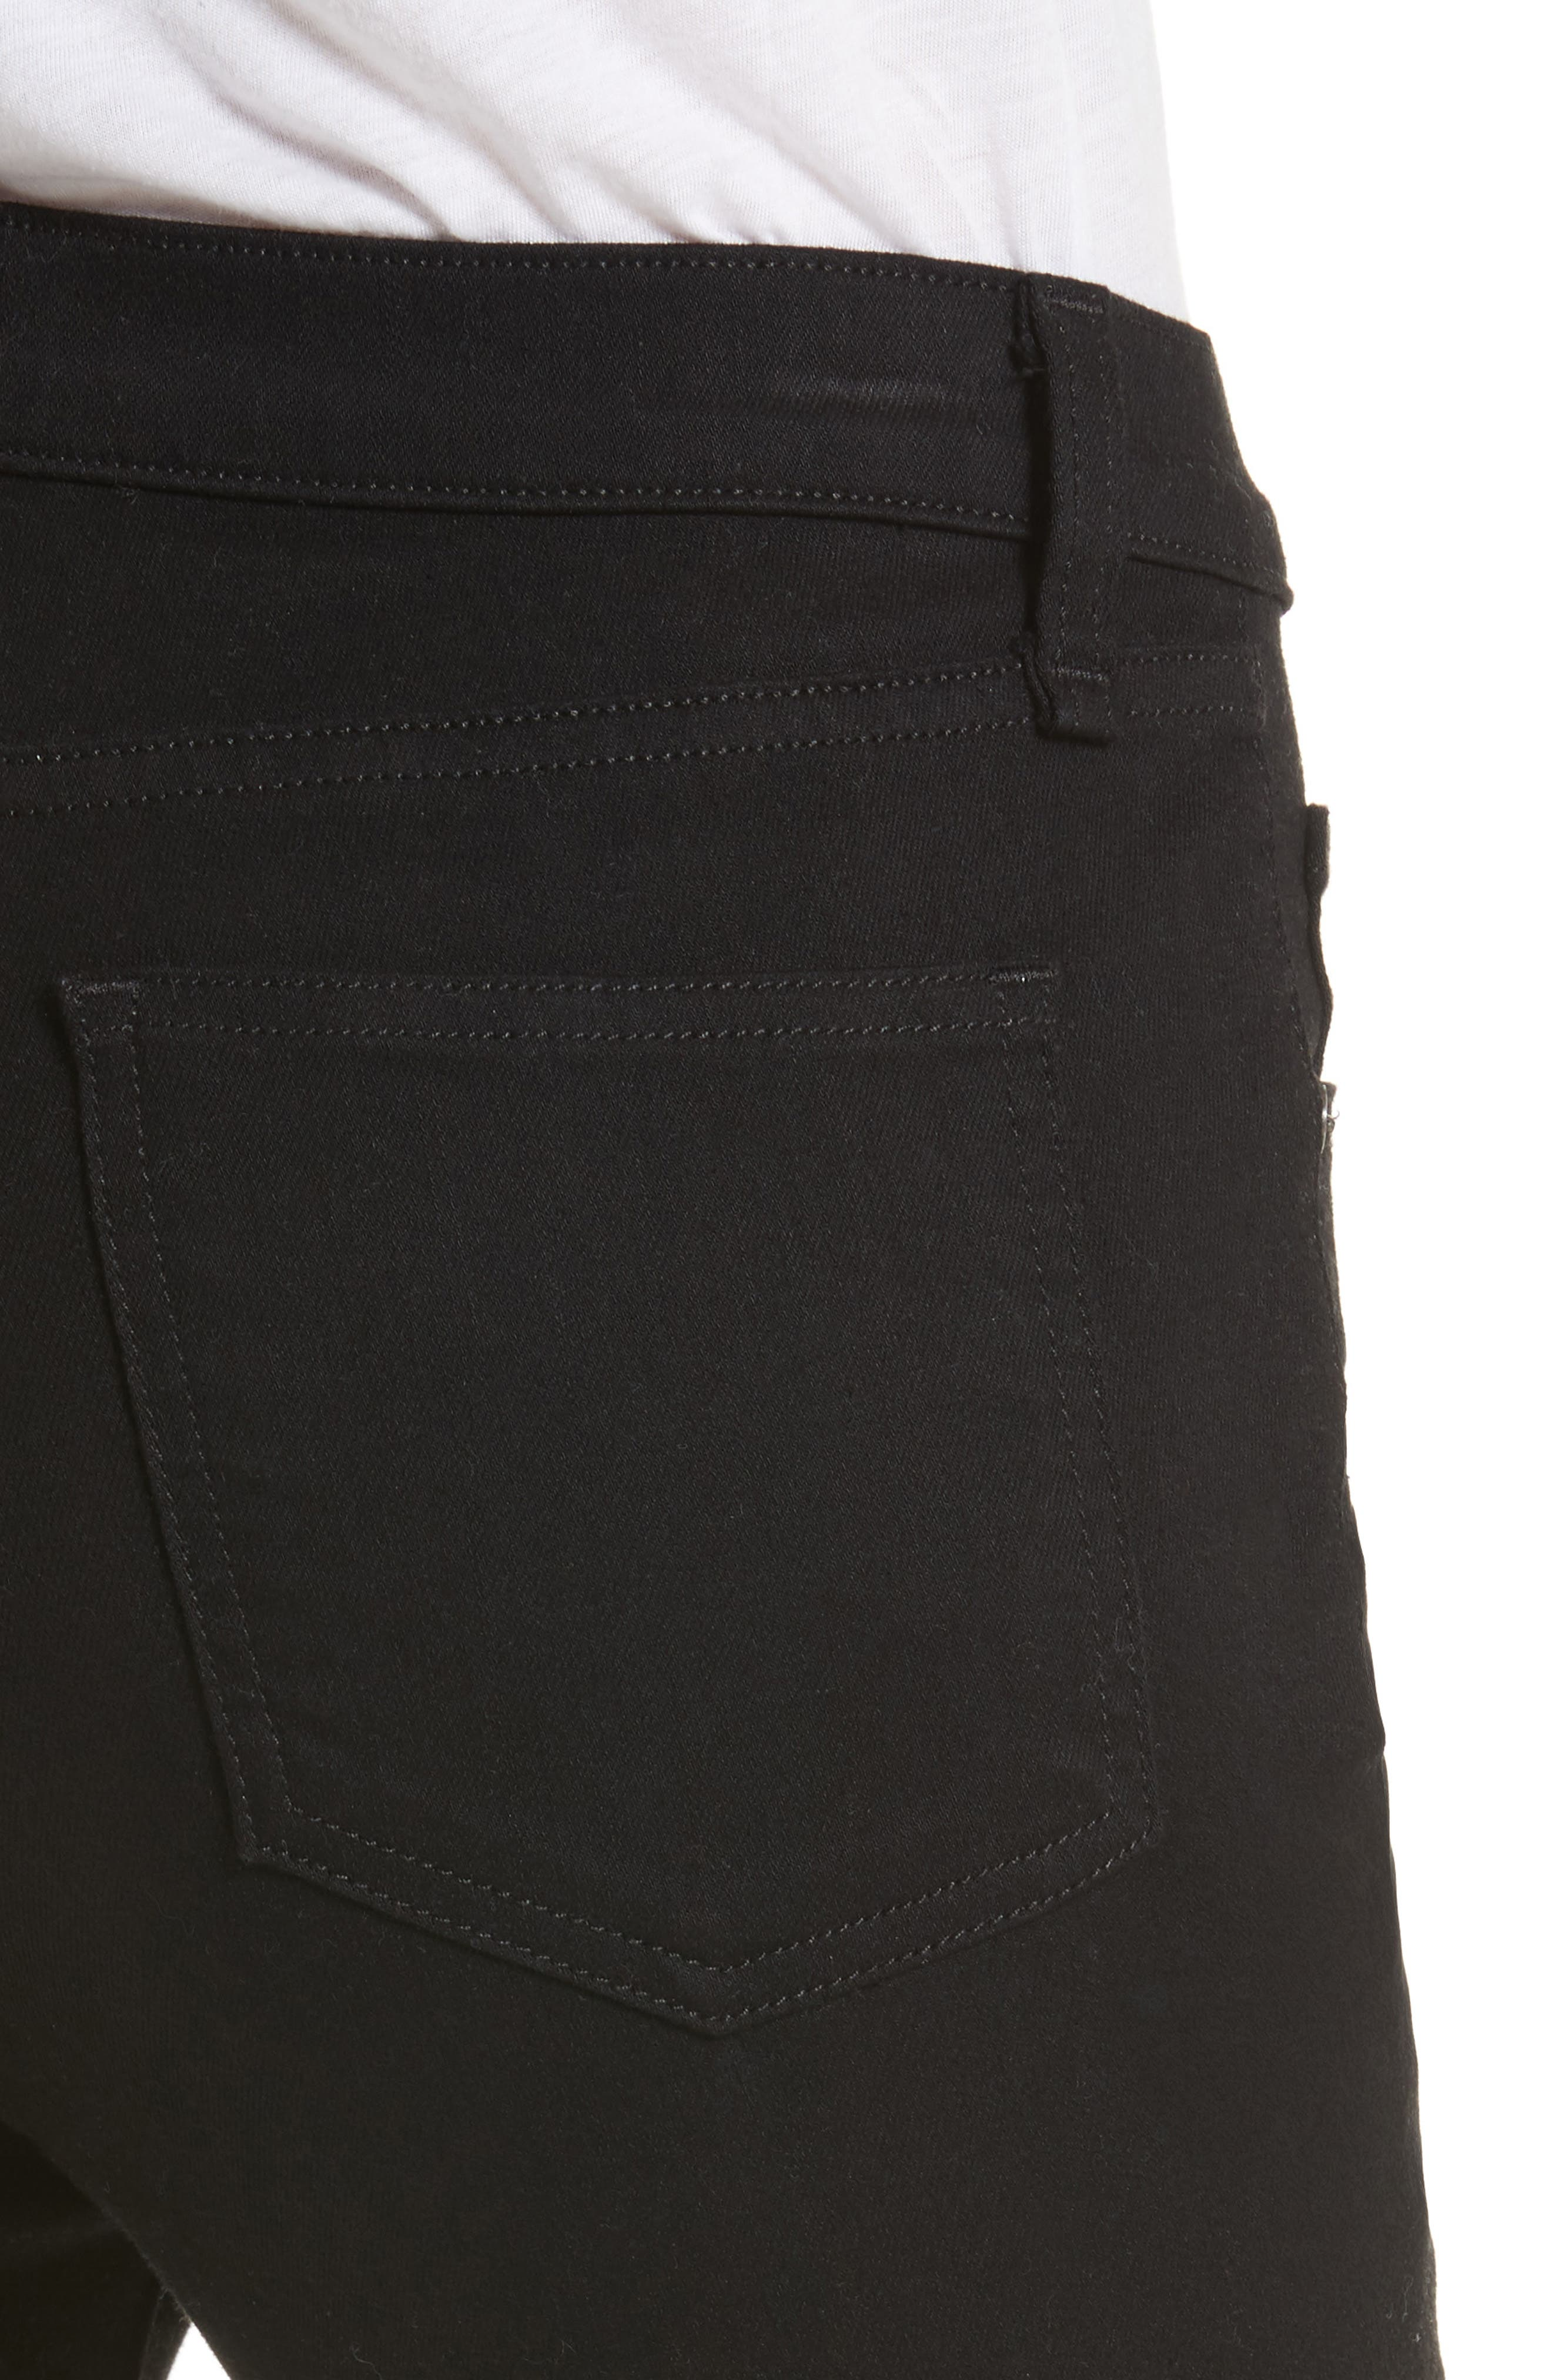 Kate 10 Skinny Jeans,                             Alternate thumbnail 4, color,                             RAVEN